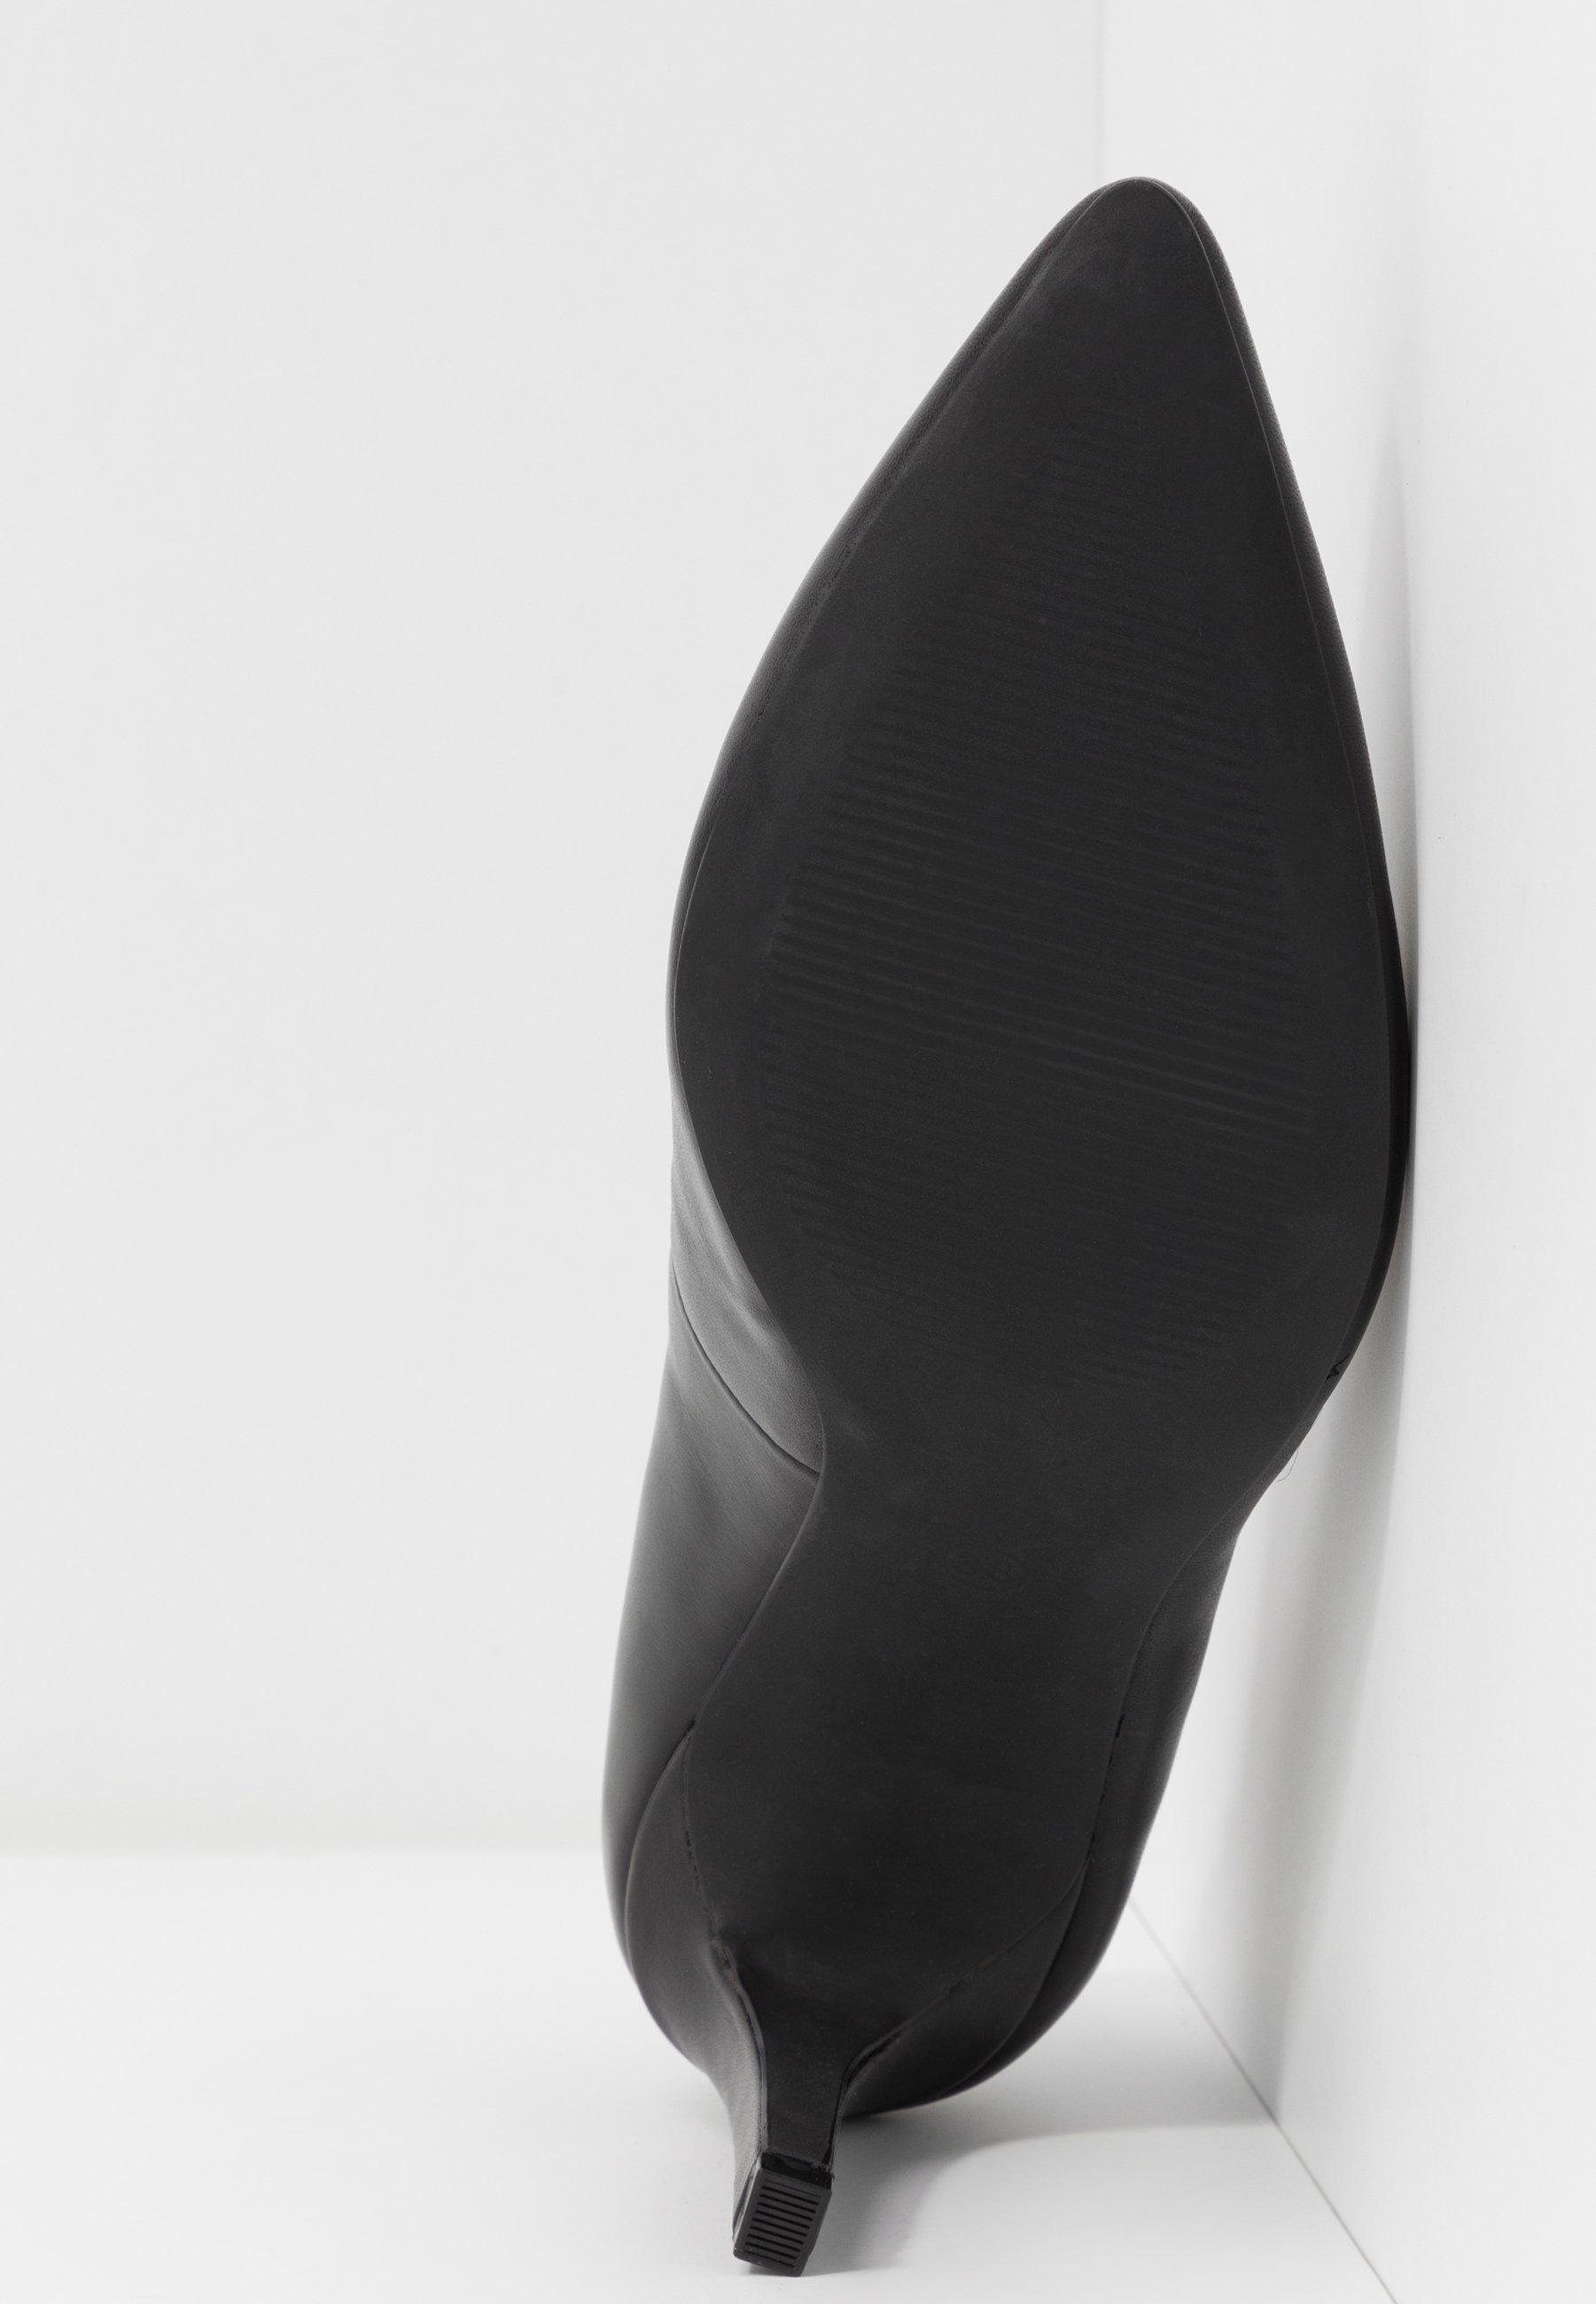 Presa Scarpe da Donna Anna Field LEATHER PUMPS Decolleté black